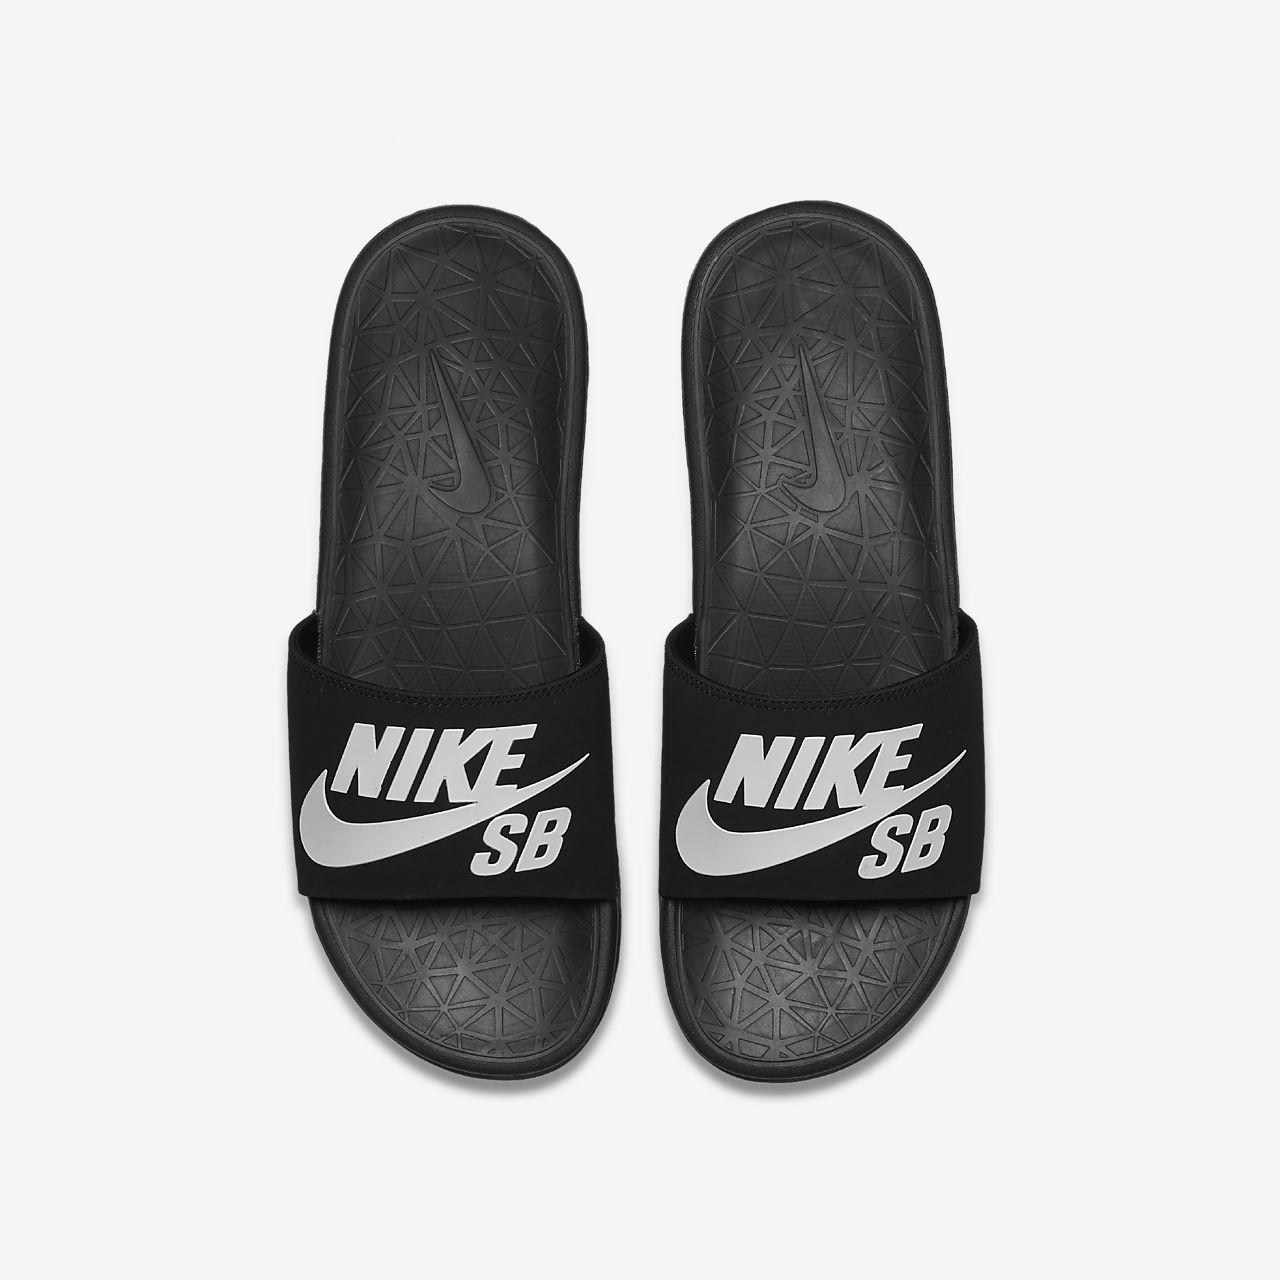 most tommy men comforter comfortable wholesale floyd p c brown flip for flipflops hilfiger sandals flops shoes